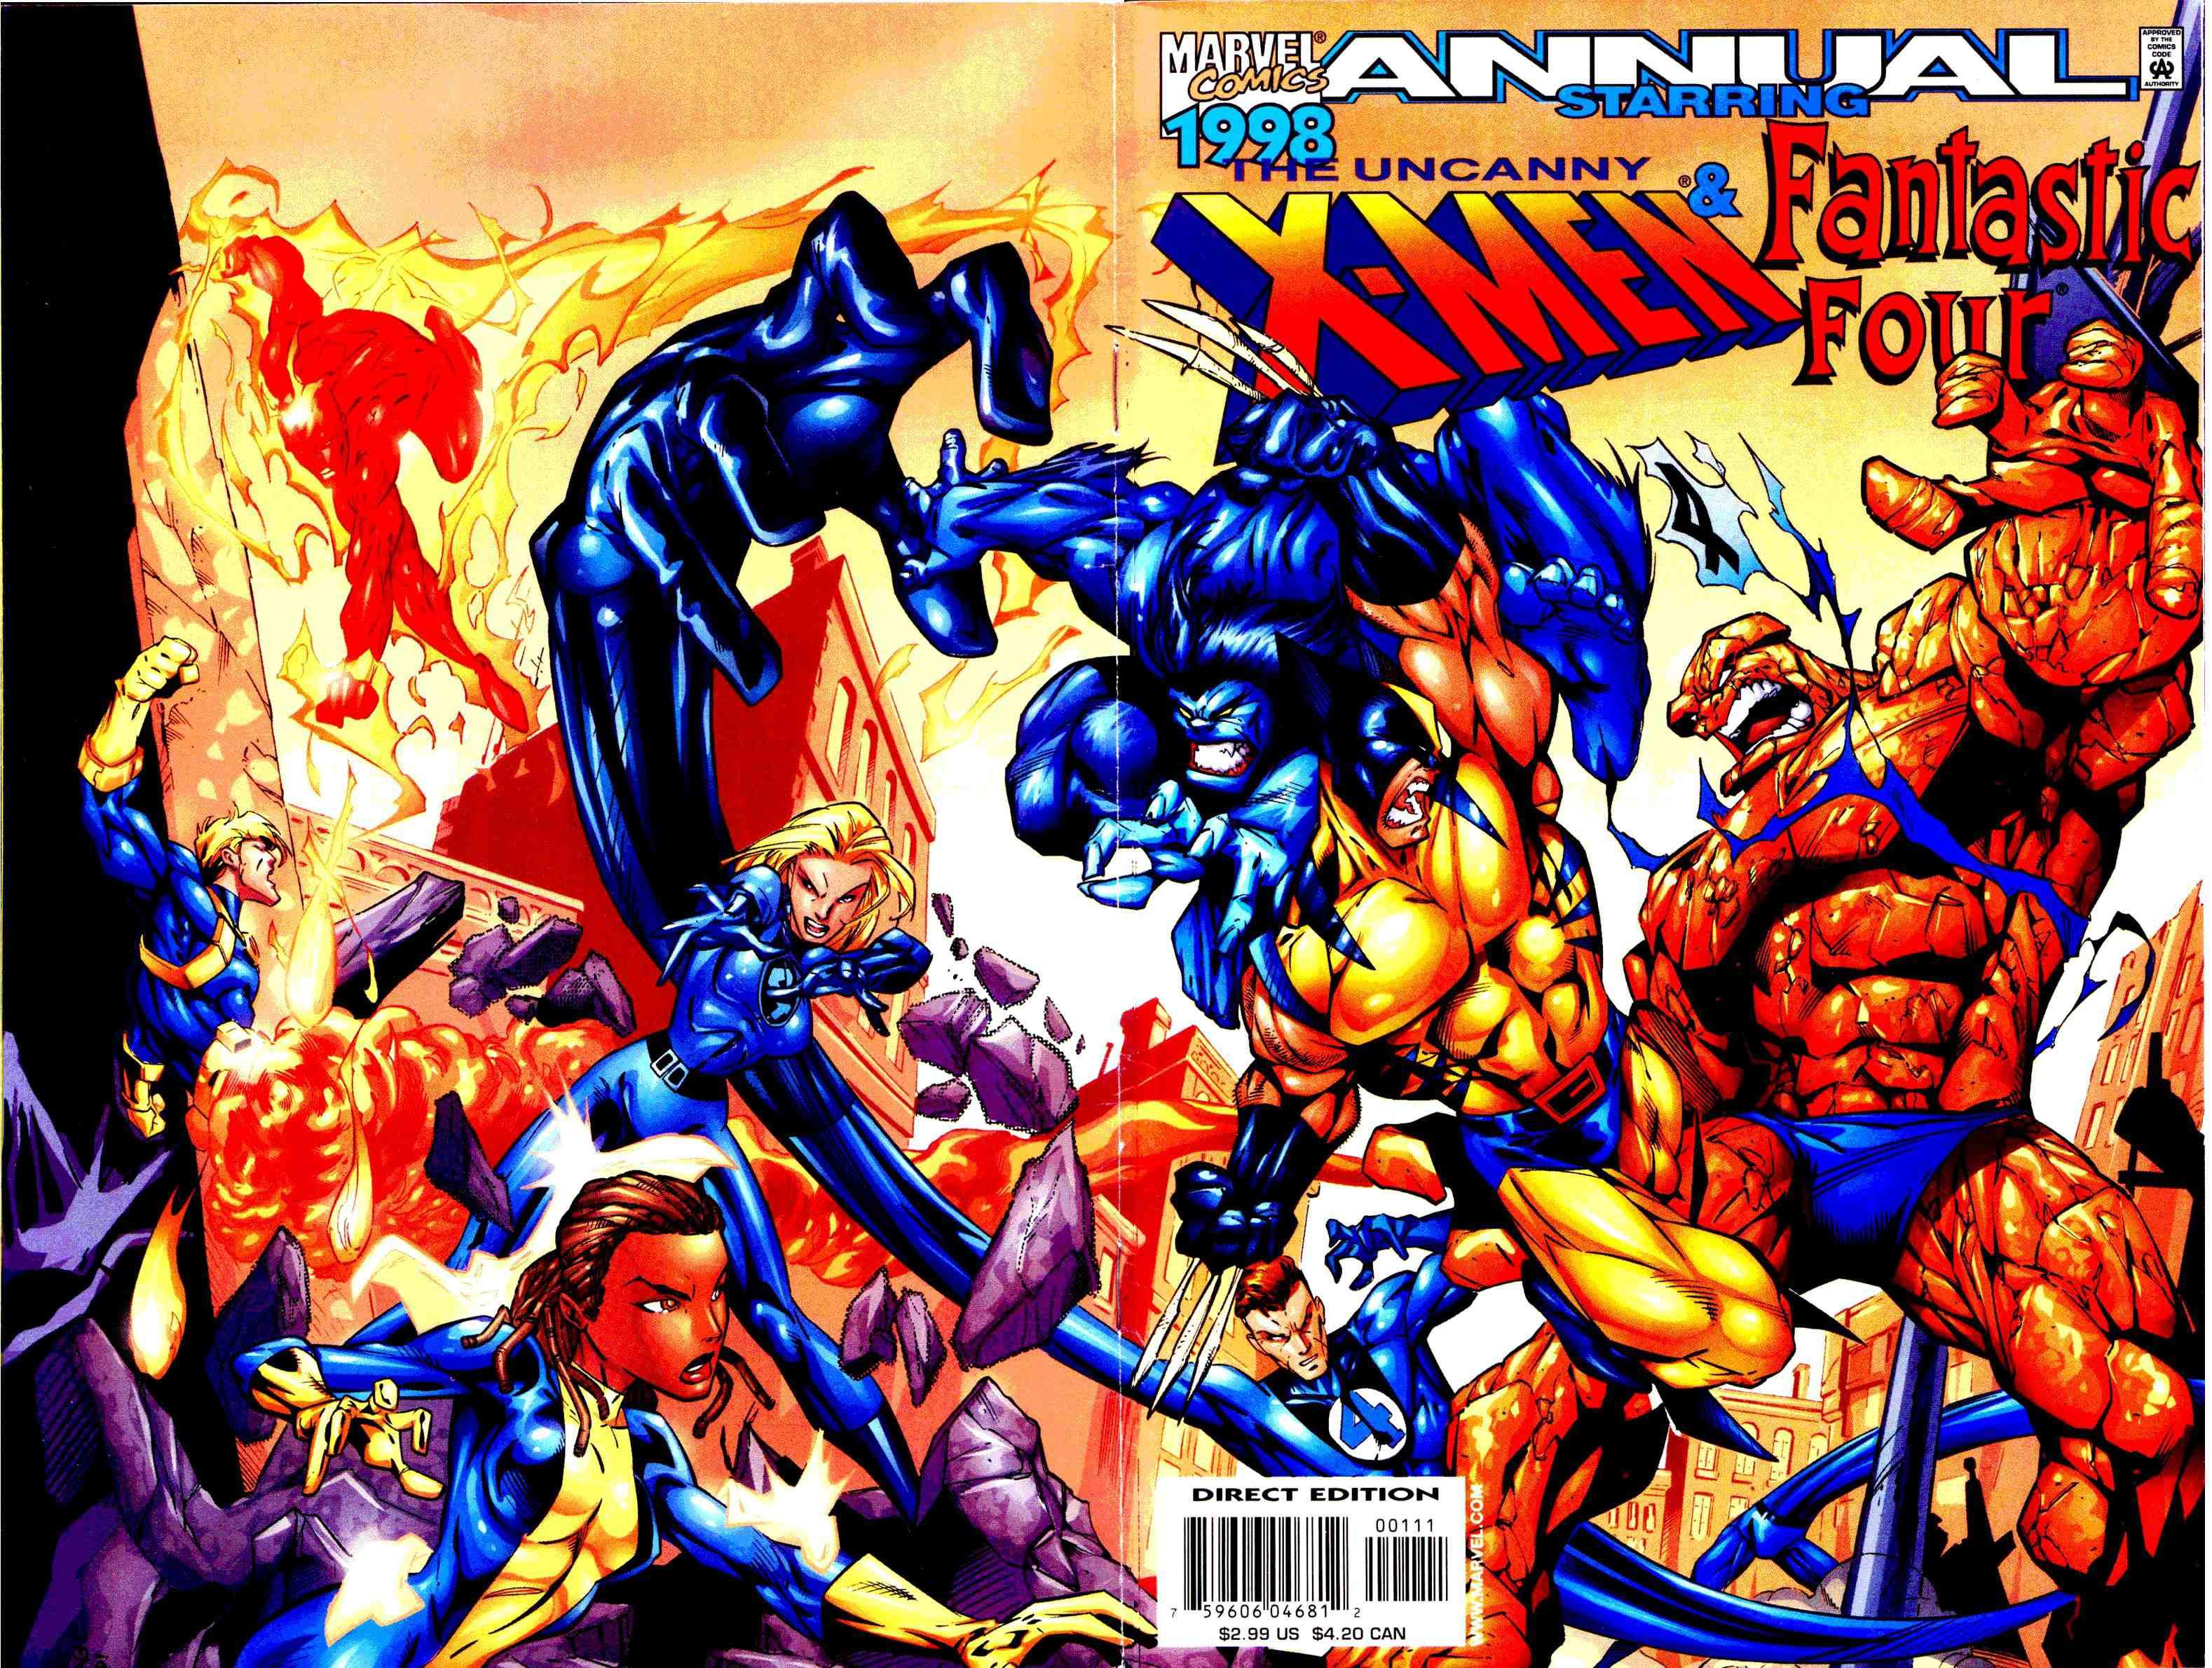 X-Men Annual 22 Page 1